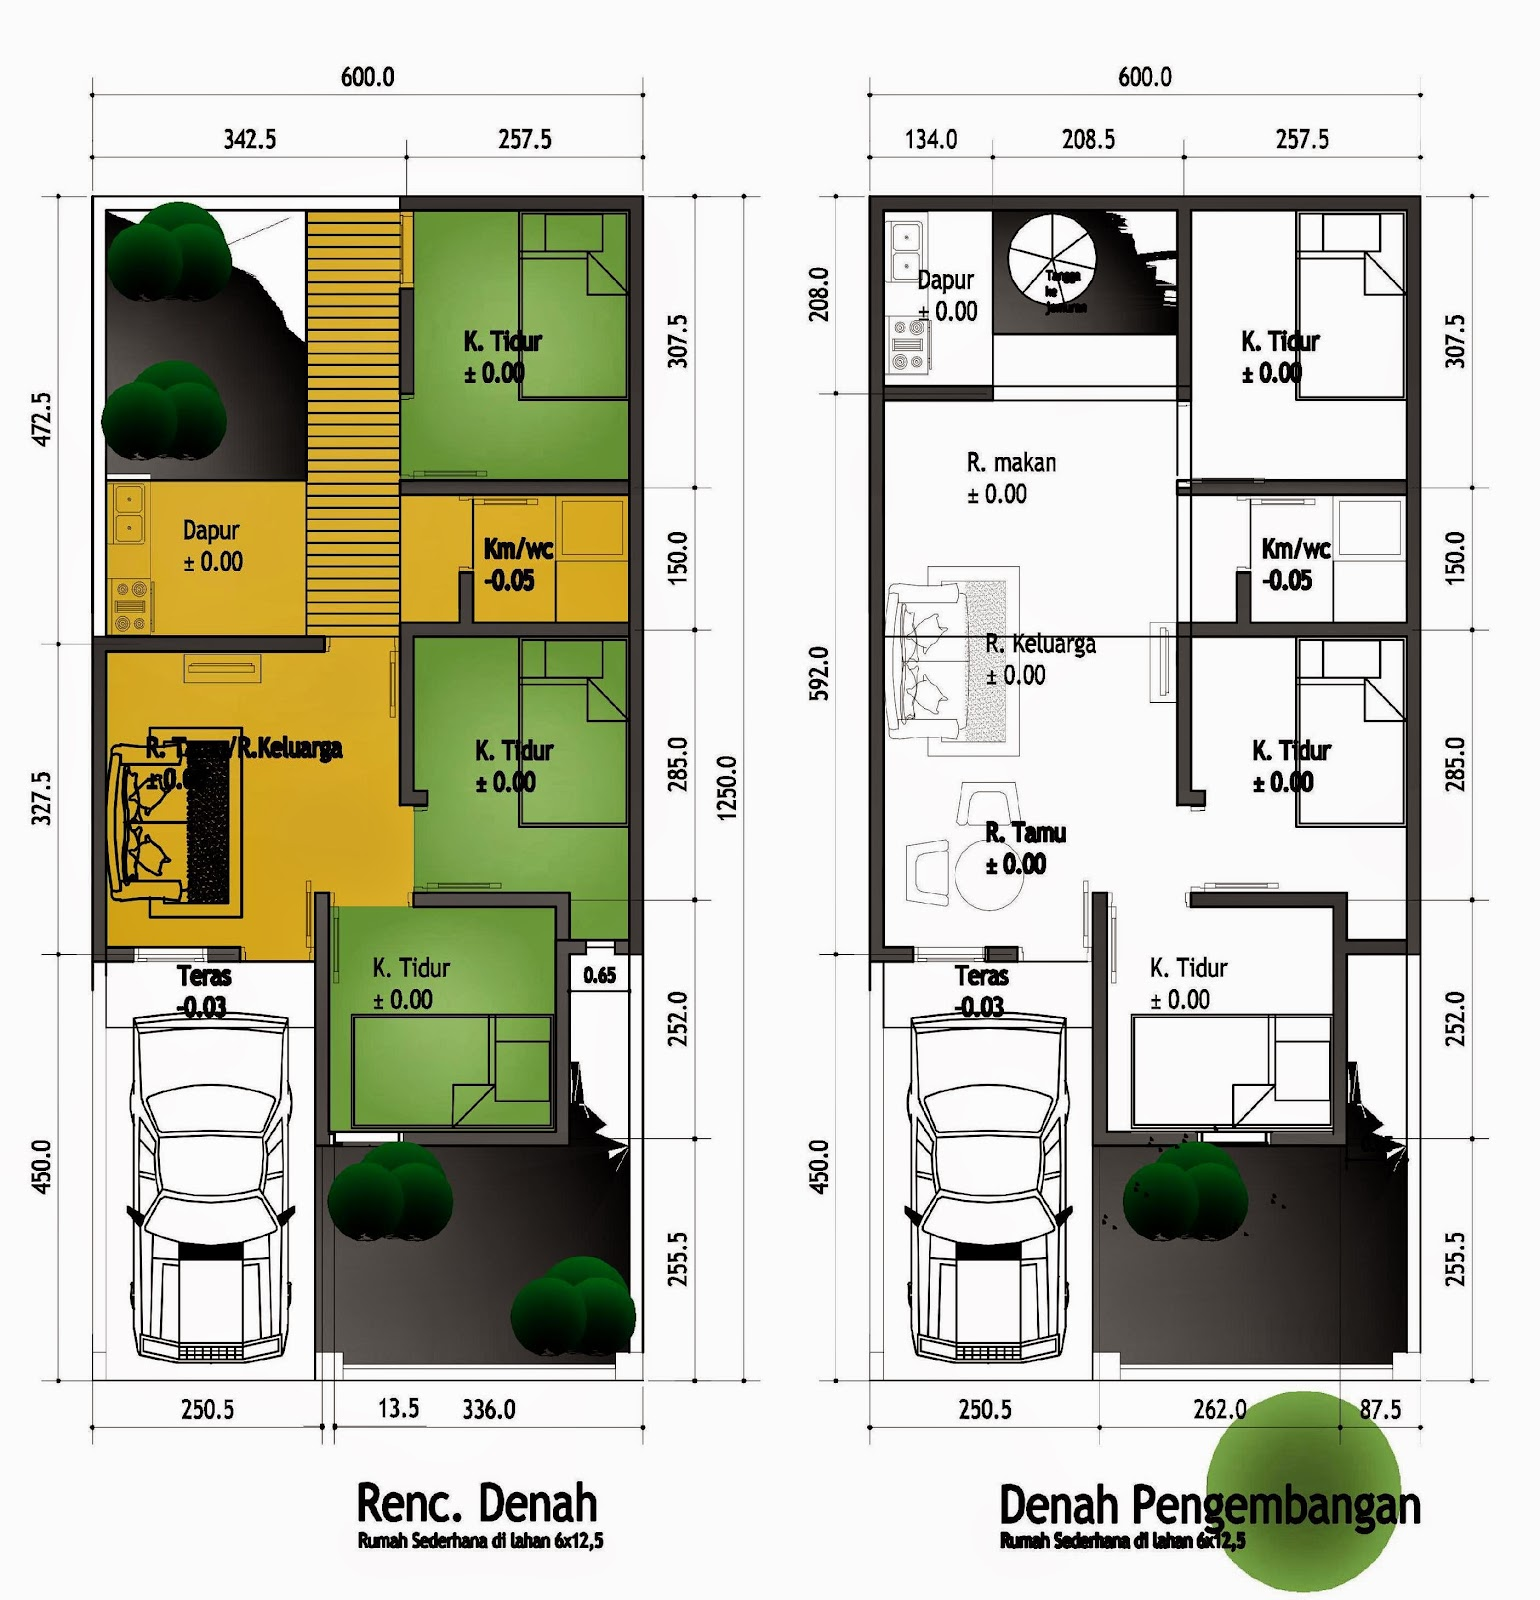 3 Contoh Denah Rumah Minimalis Modern Terbaru: Contoh Desain Rumah Minimalis Modern